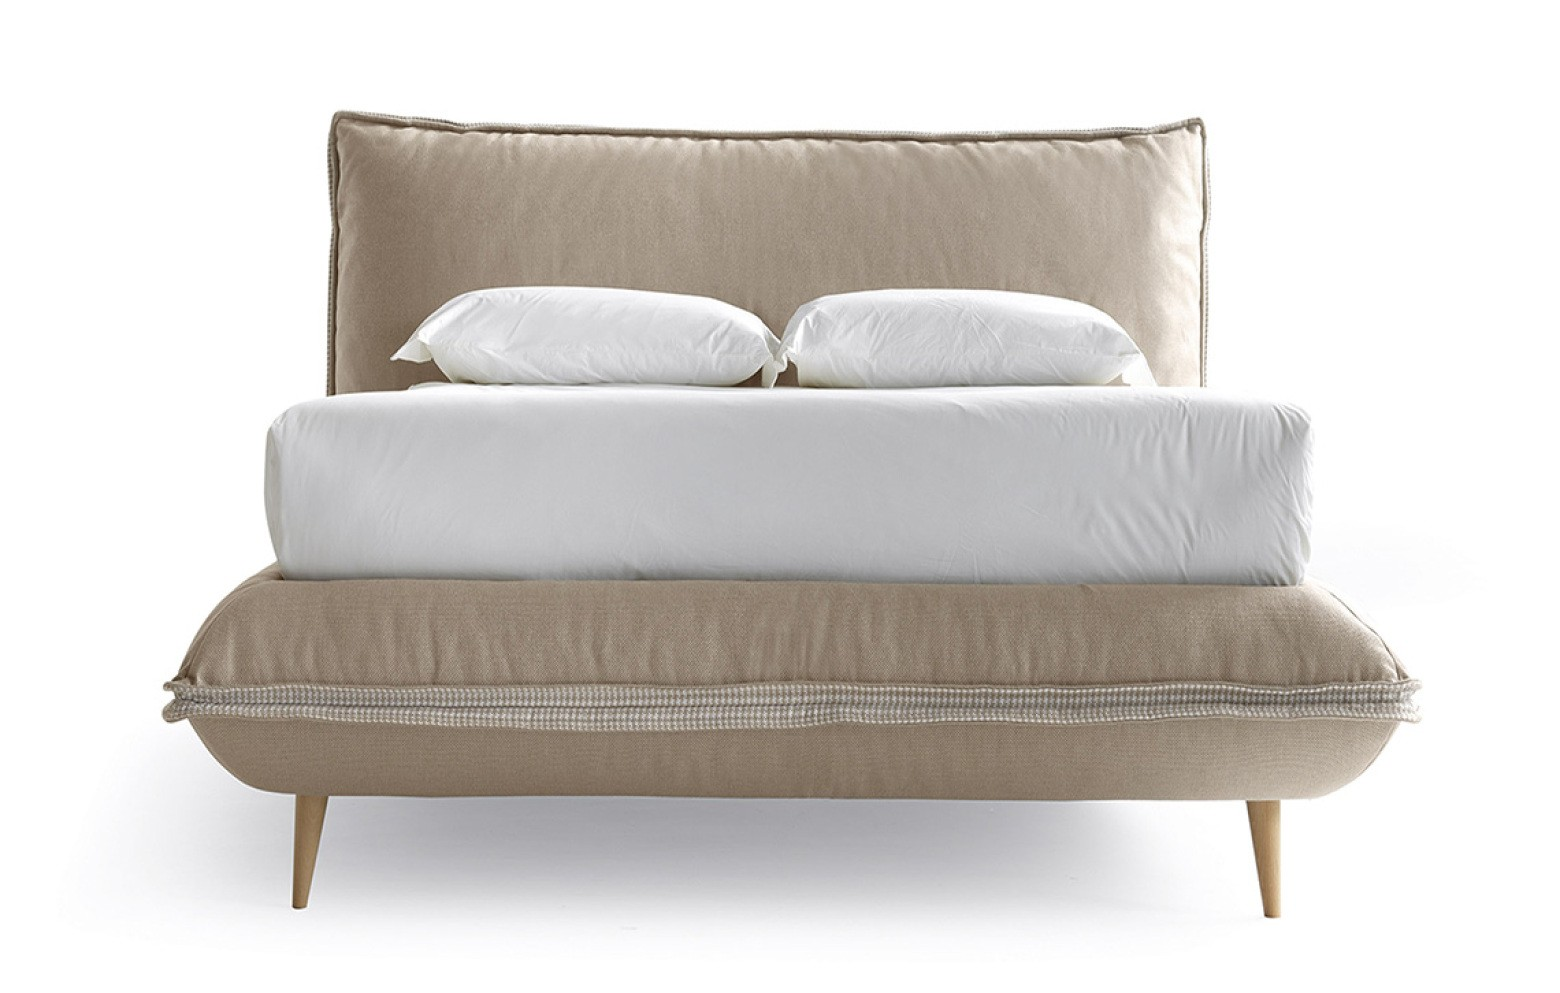 davis betten betten schr nke who 39 s perfect. Black Bedroom Furniture Sets. Home Design Ideas